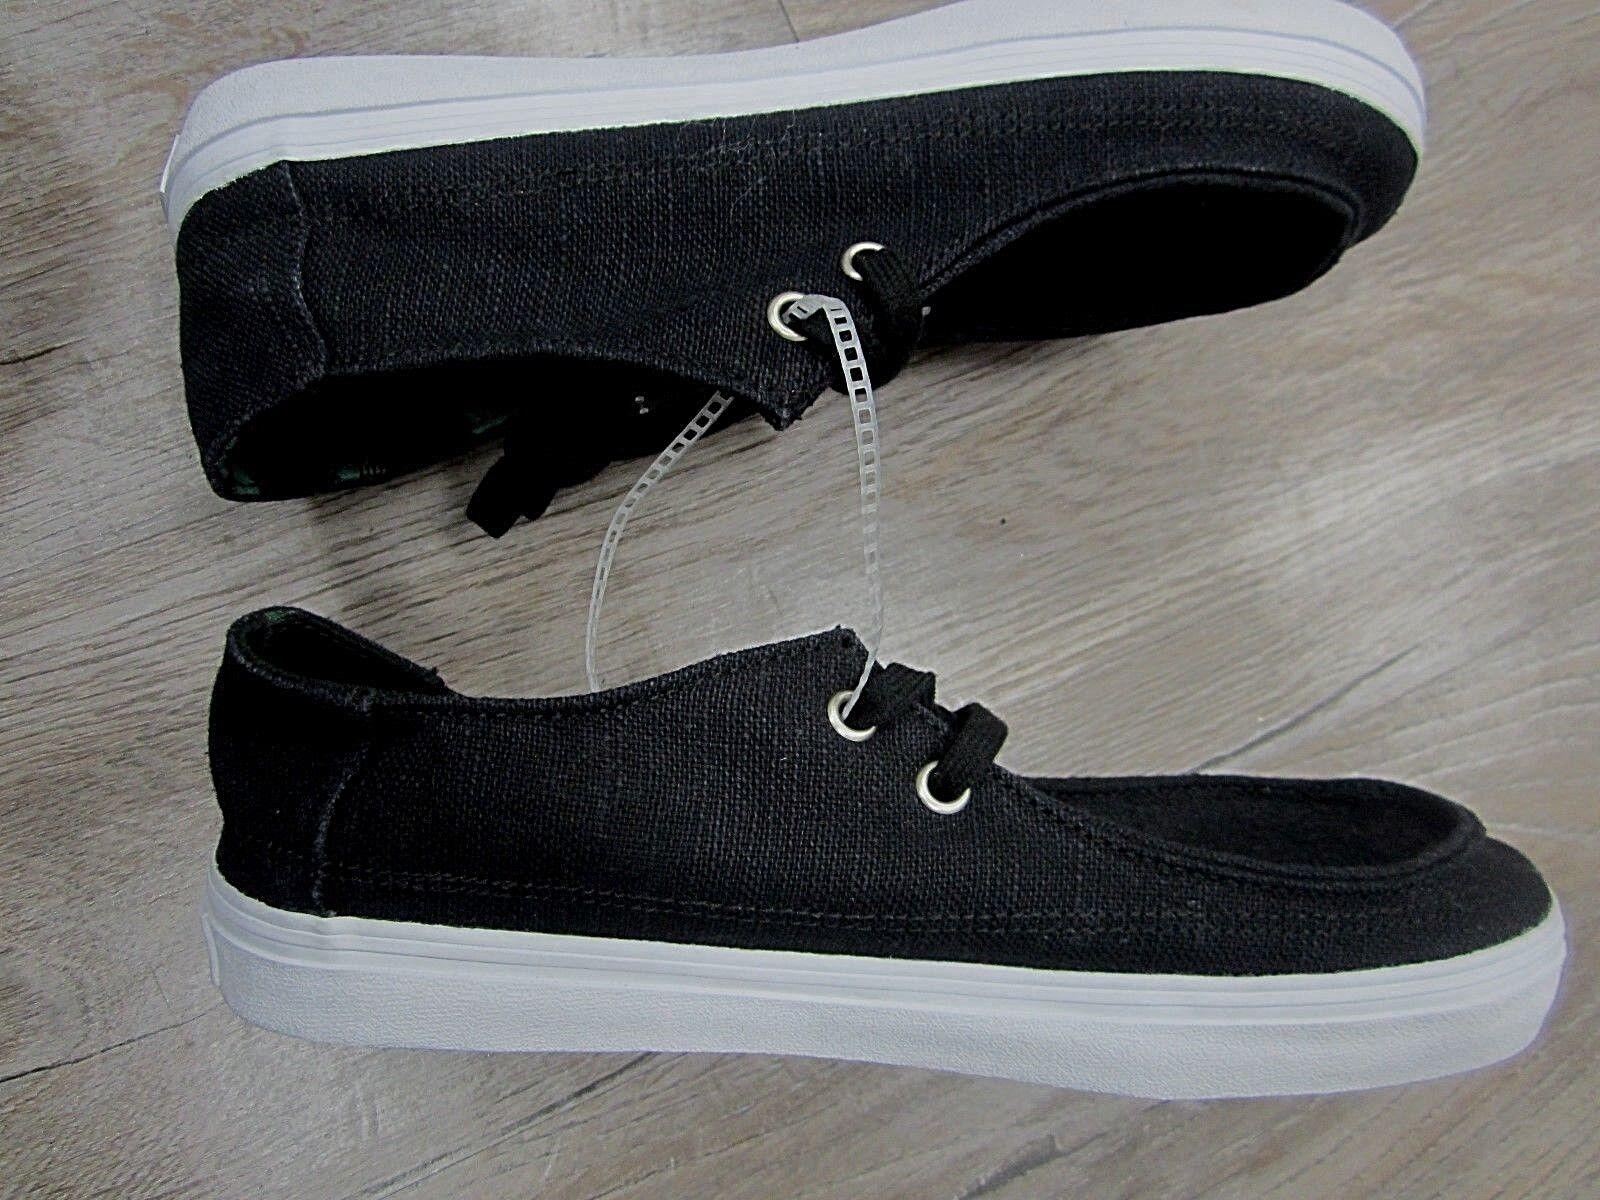 NEW Vans  Ultra Low Totem Black with Ultra  Cush Men's Size 6.5 1554c1